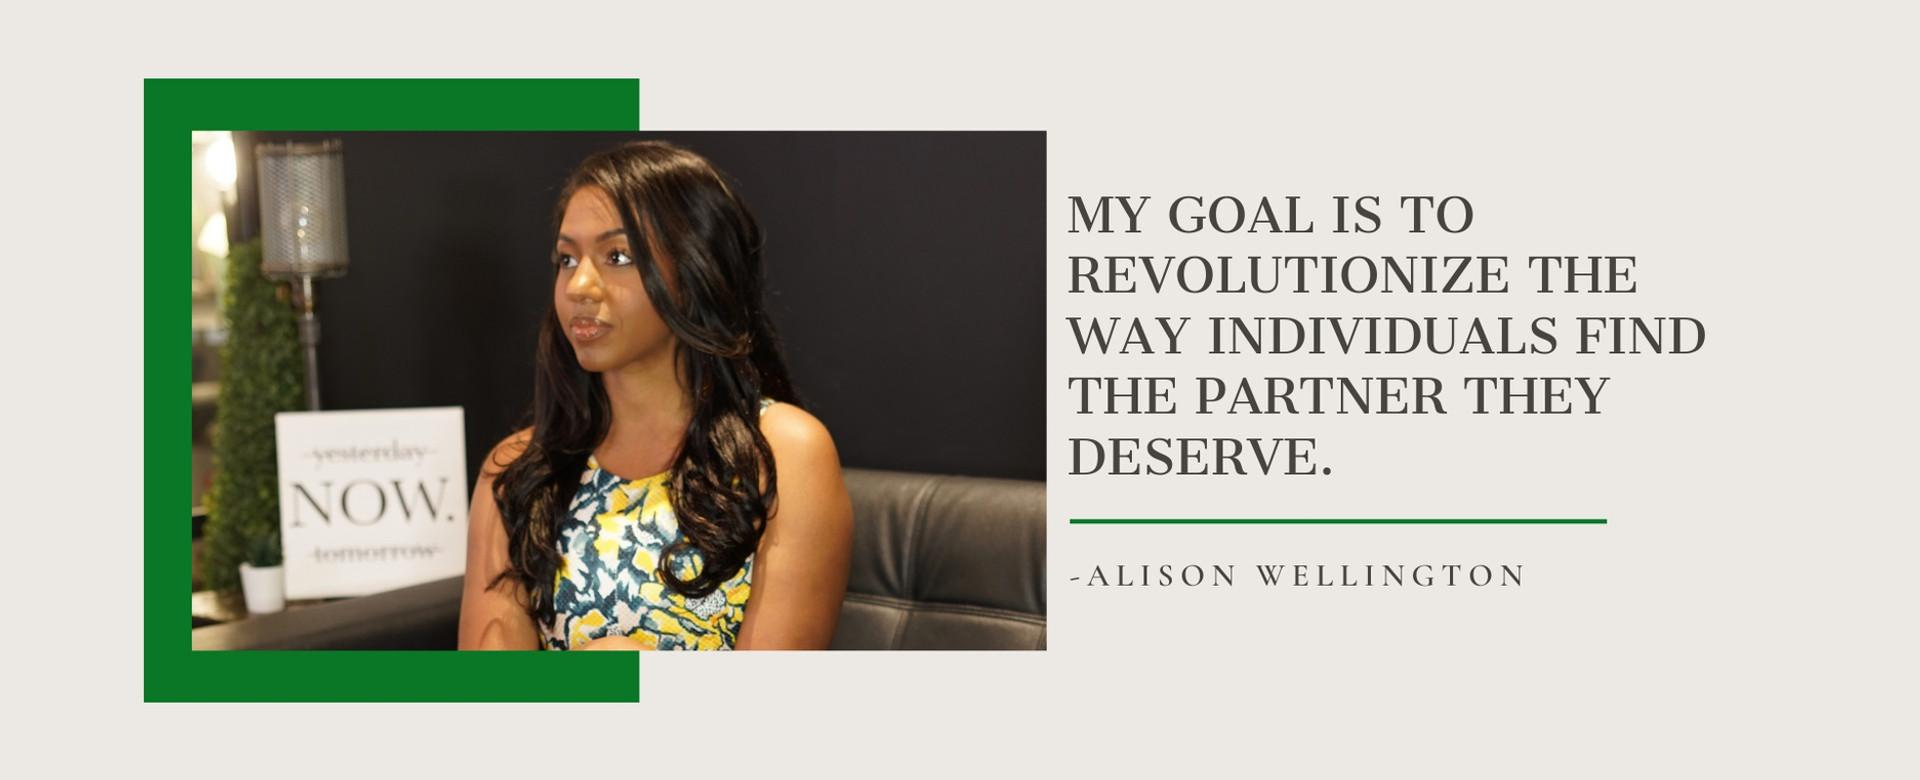 Alison wallington Goal.jpg